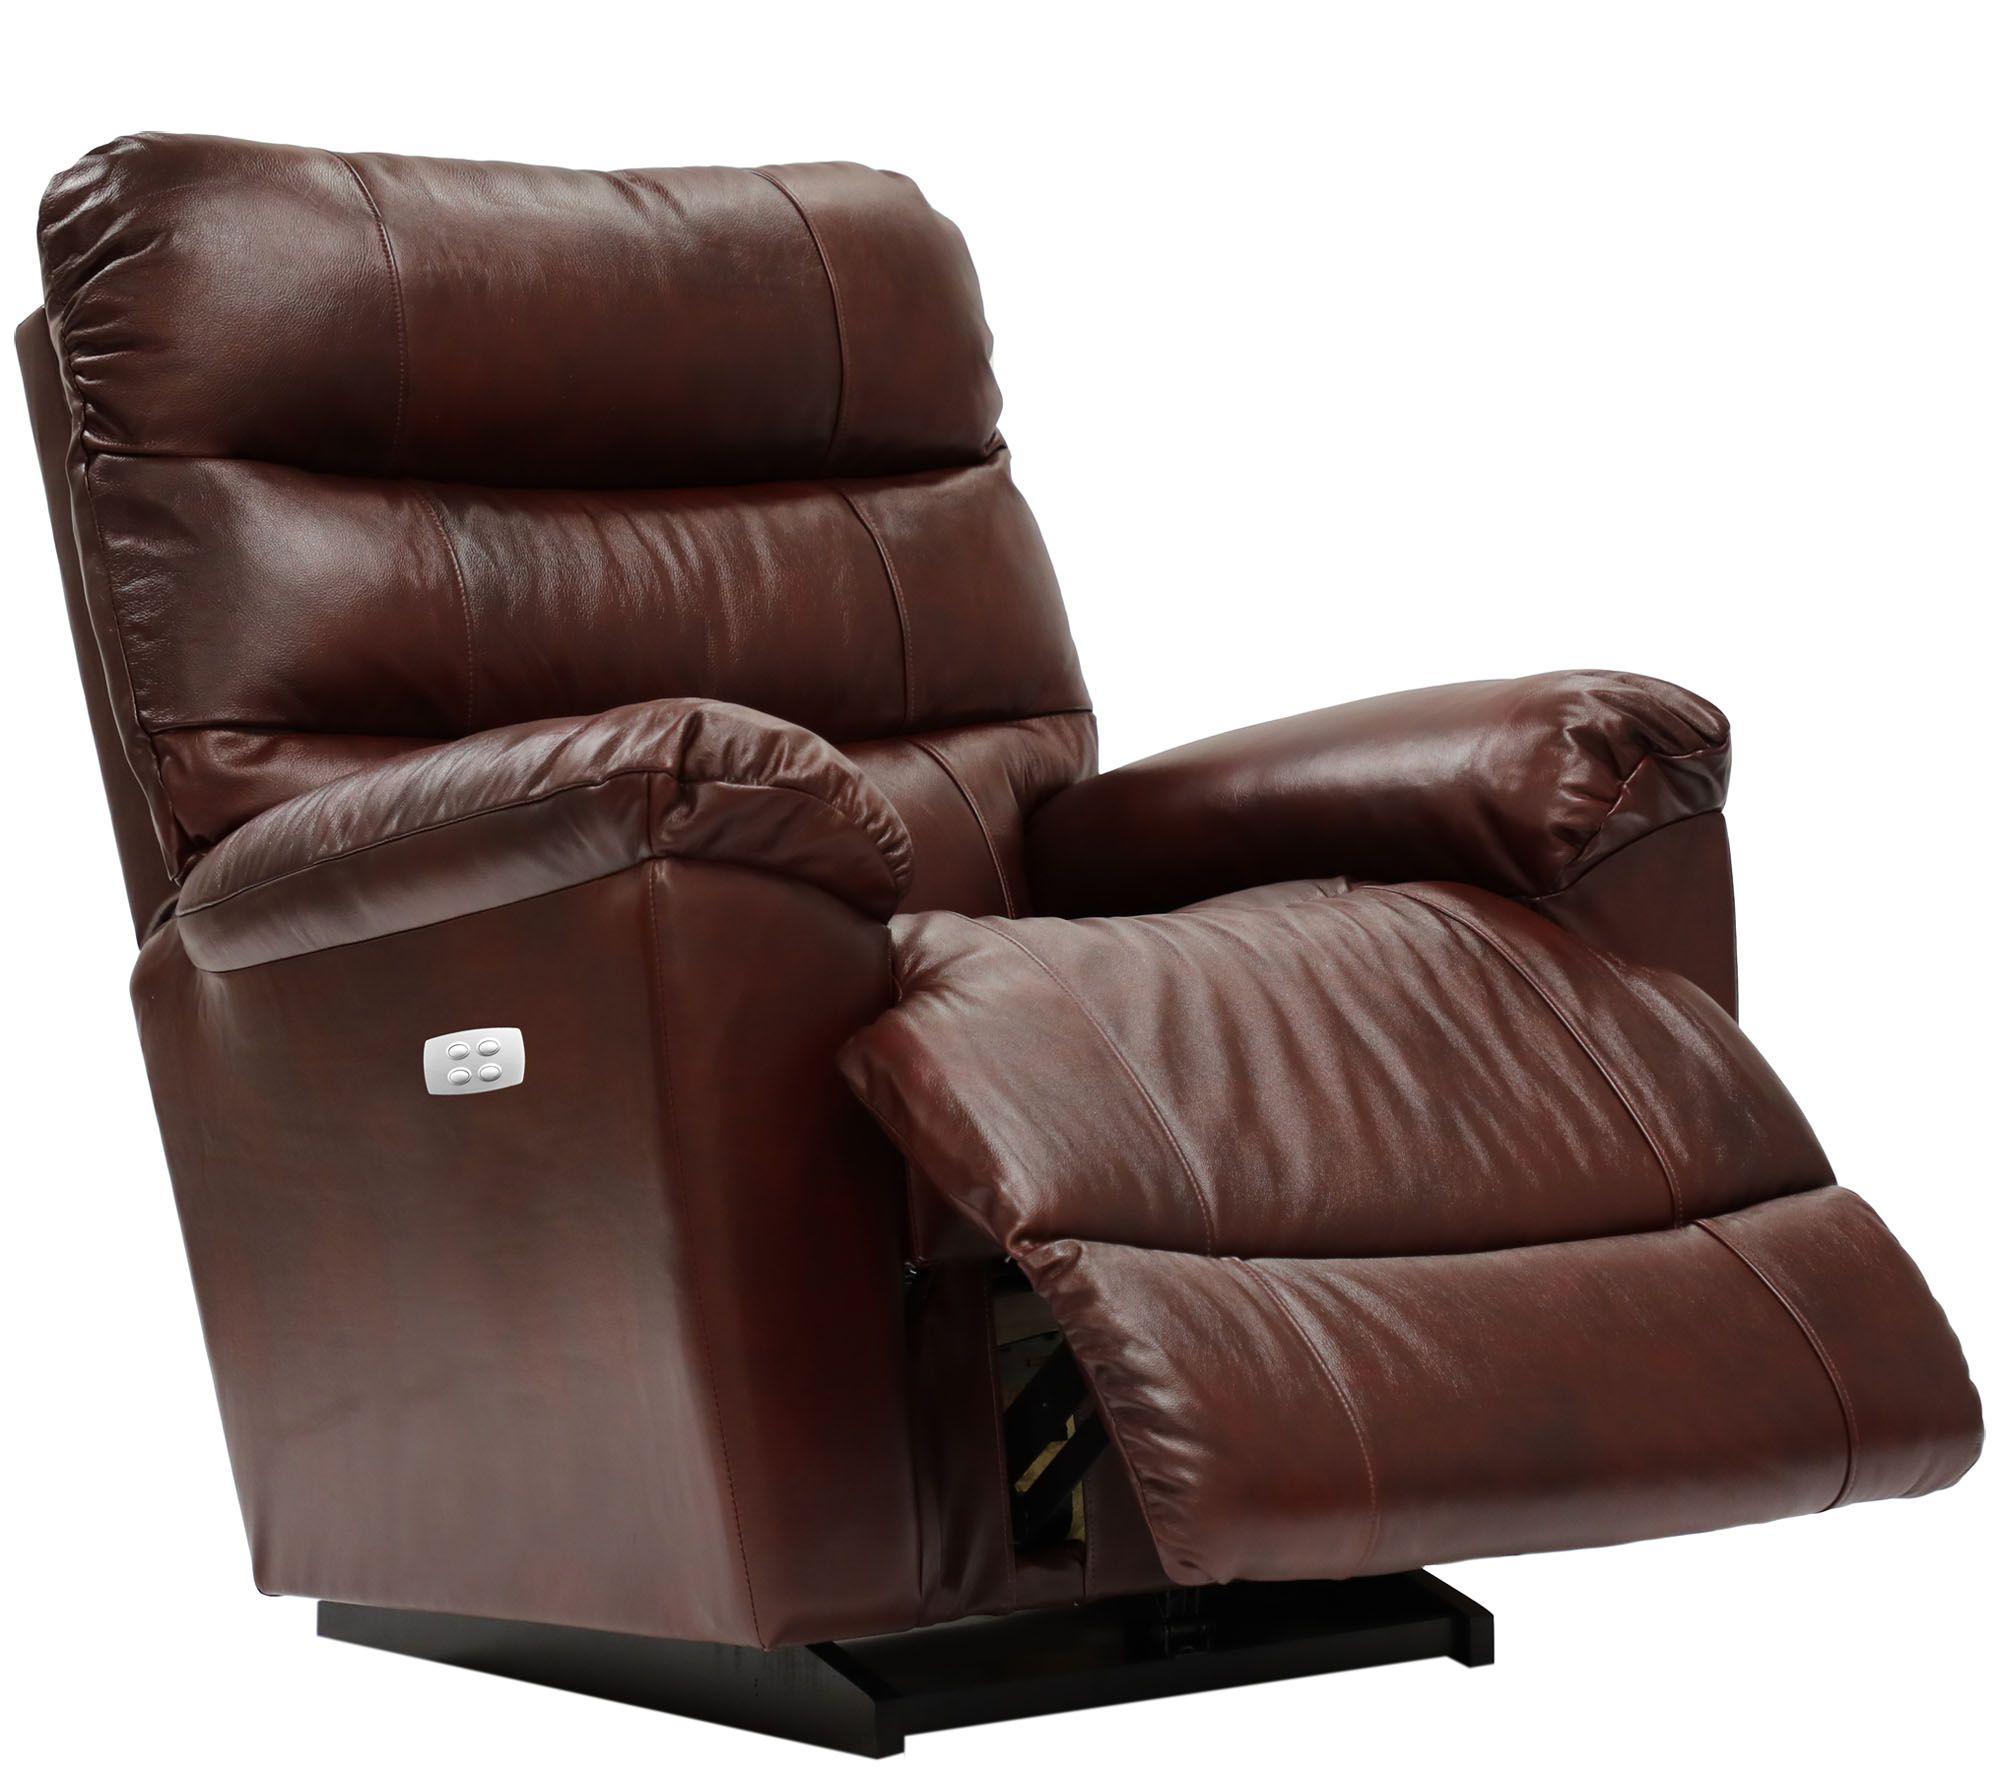 Sensational La Z Boy Marco Leather Power Xr Recliner Qvc Com Short Links Chair Design For Home Short Linksinfo